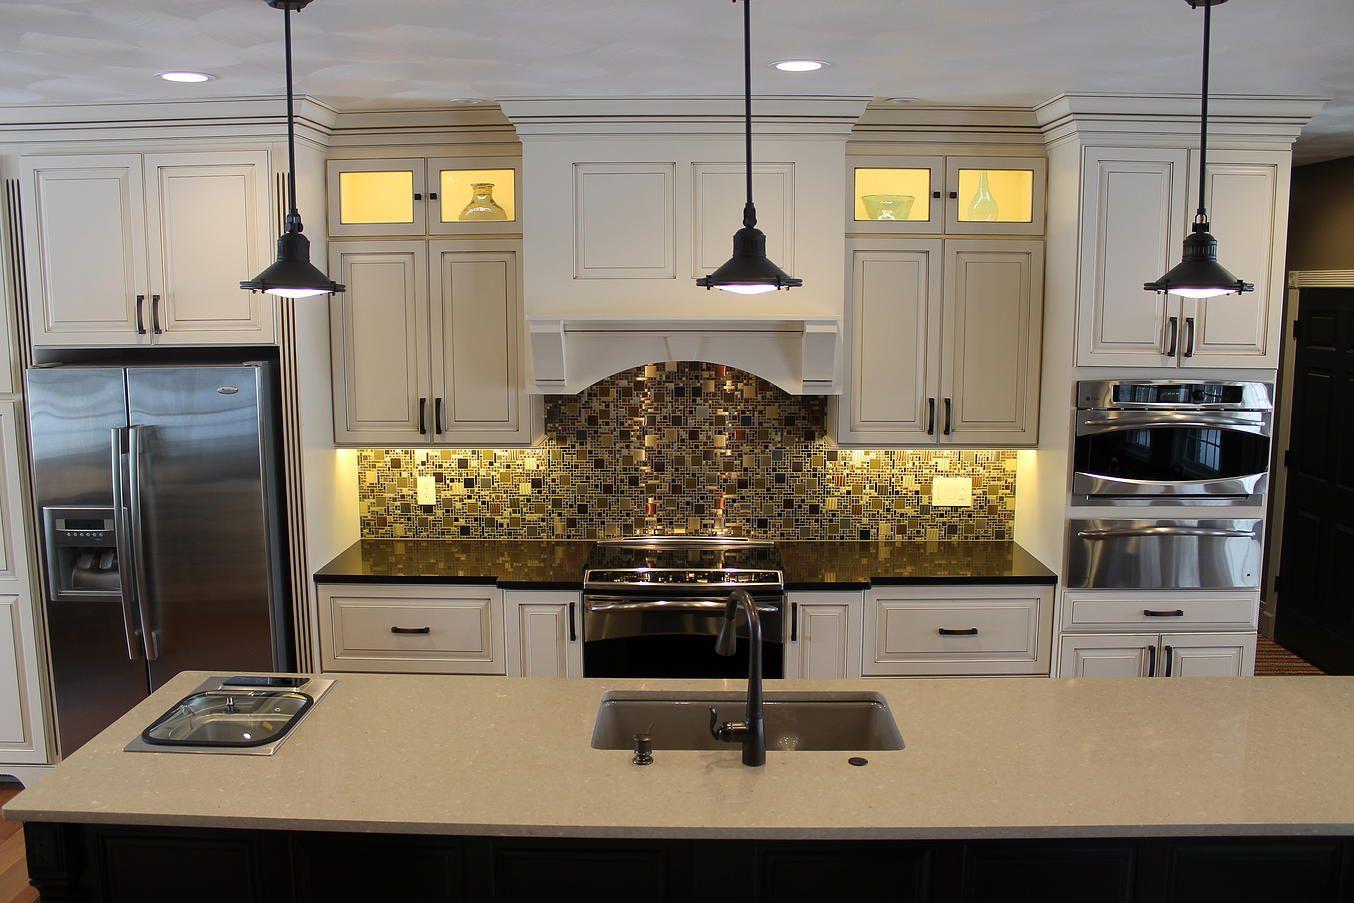 Bailey Hardwoods Woodworking Springfield Il Kitchen Cabinet Design Kitchen Cabinets Kitchen And Bath Design